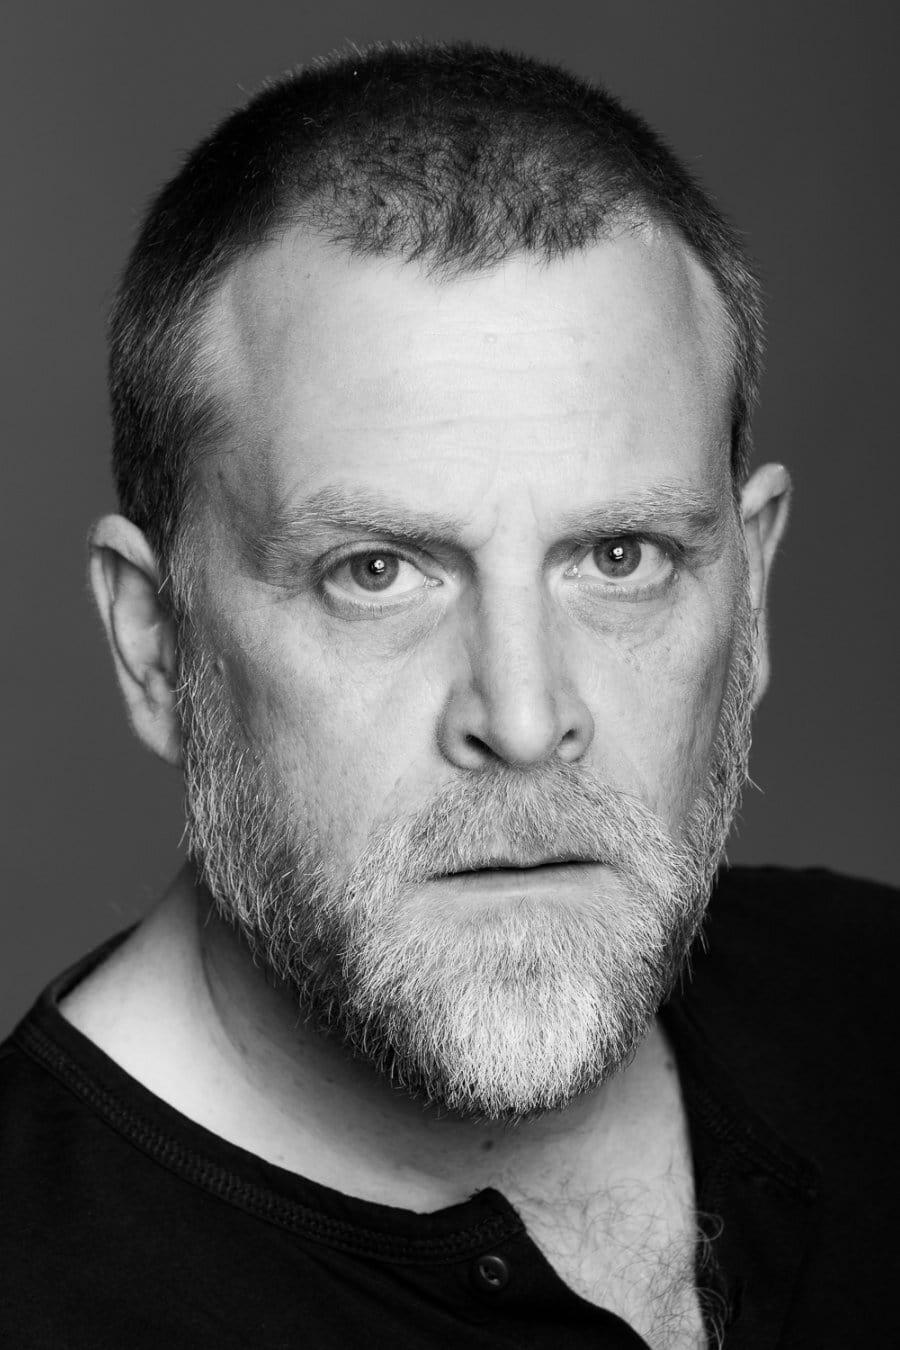 Keith Newby